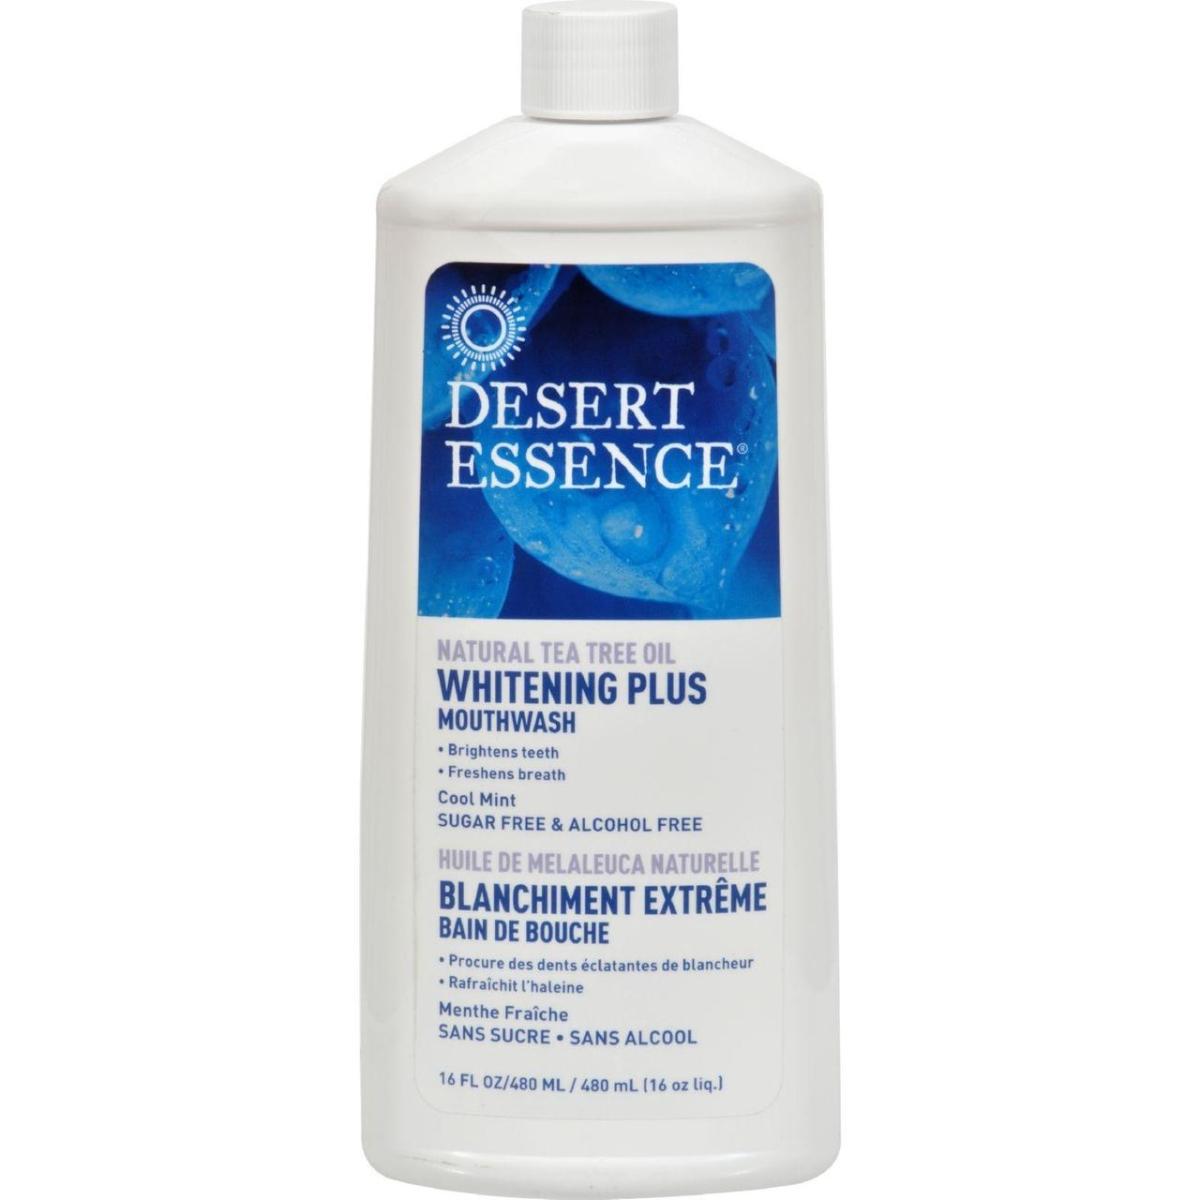 Desert Essence HG1246560 16 fl oz Tea Tree Whitening Mint Mouthwash